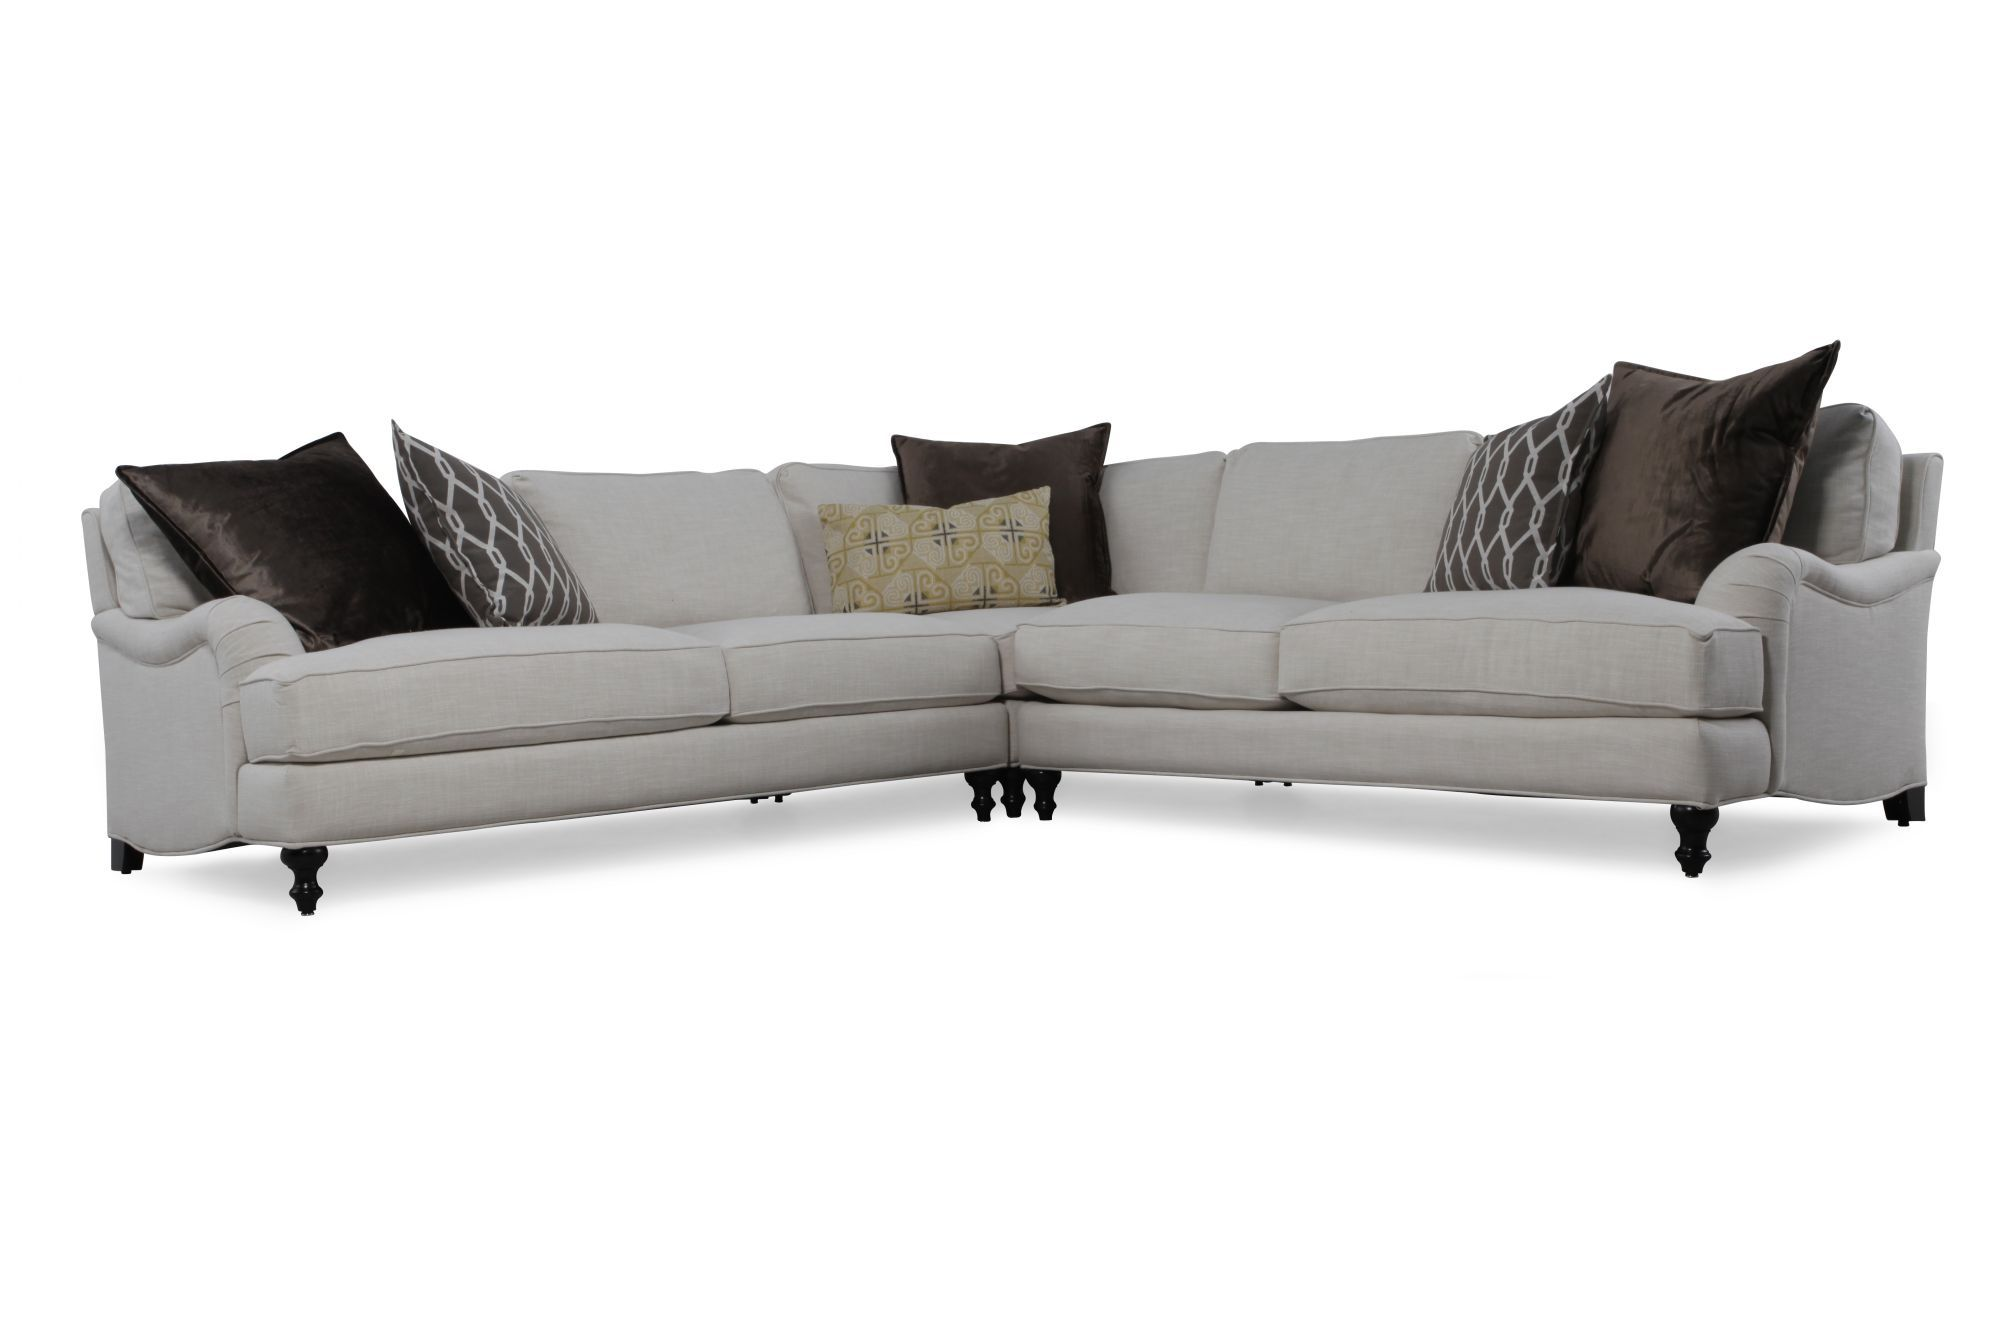 jonathan louis sofa bed black grey corner modular rattan weave set garden furniture clarice sectional pinterest